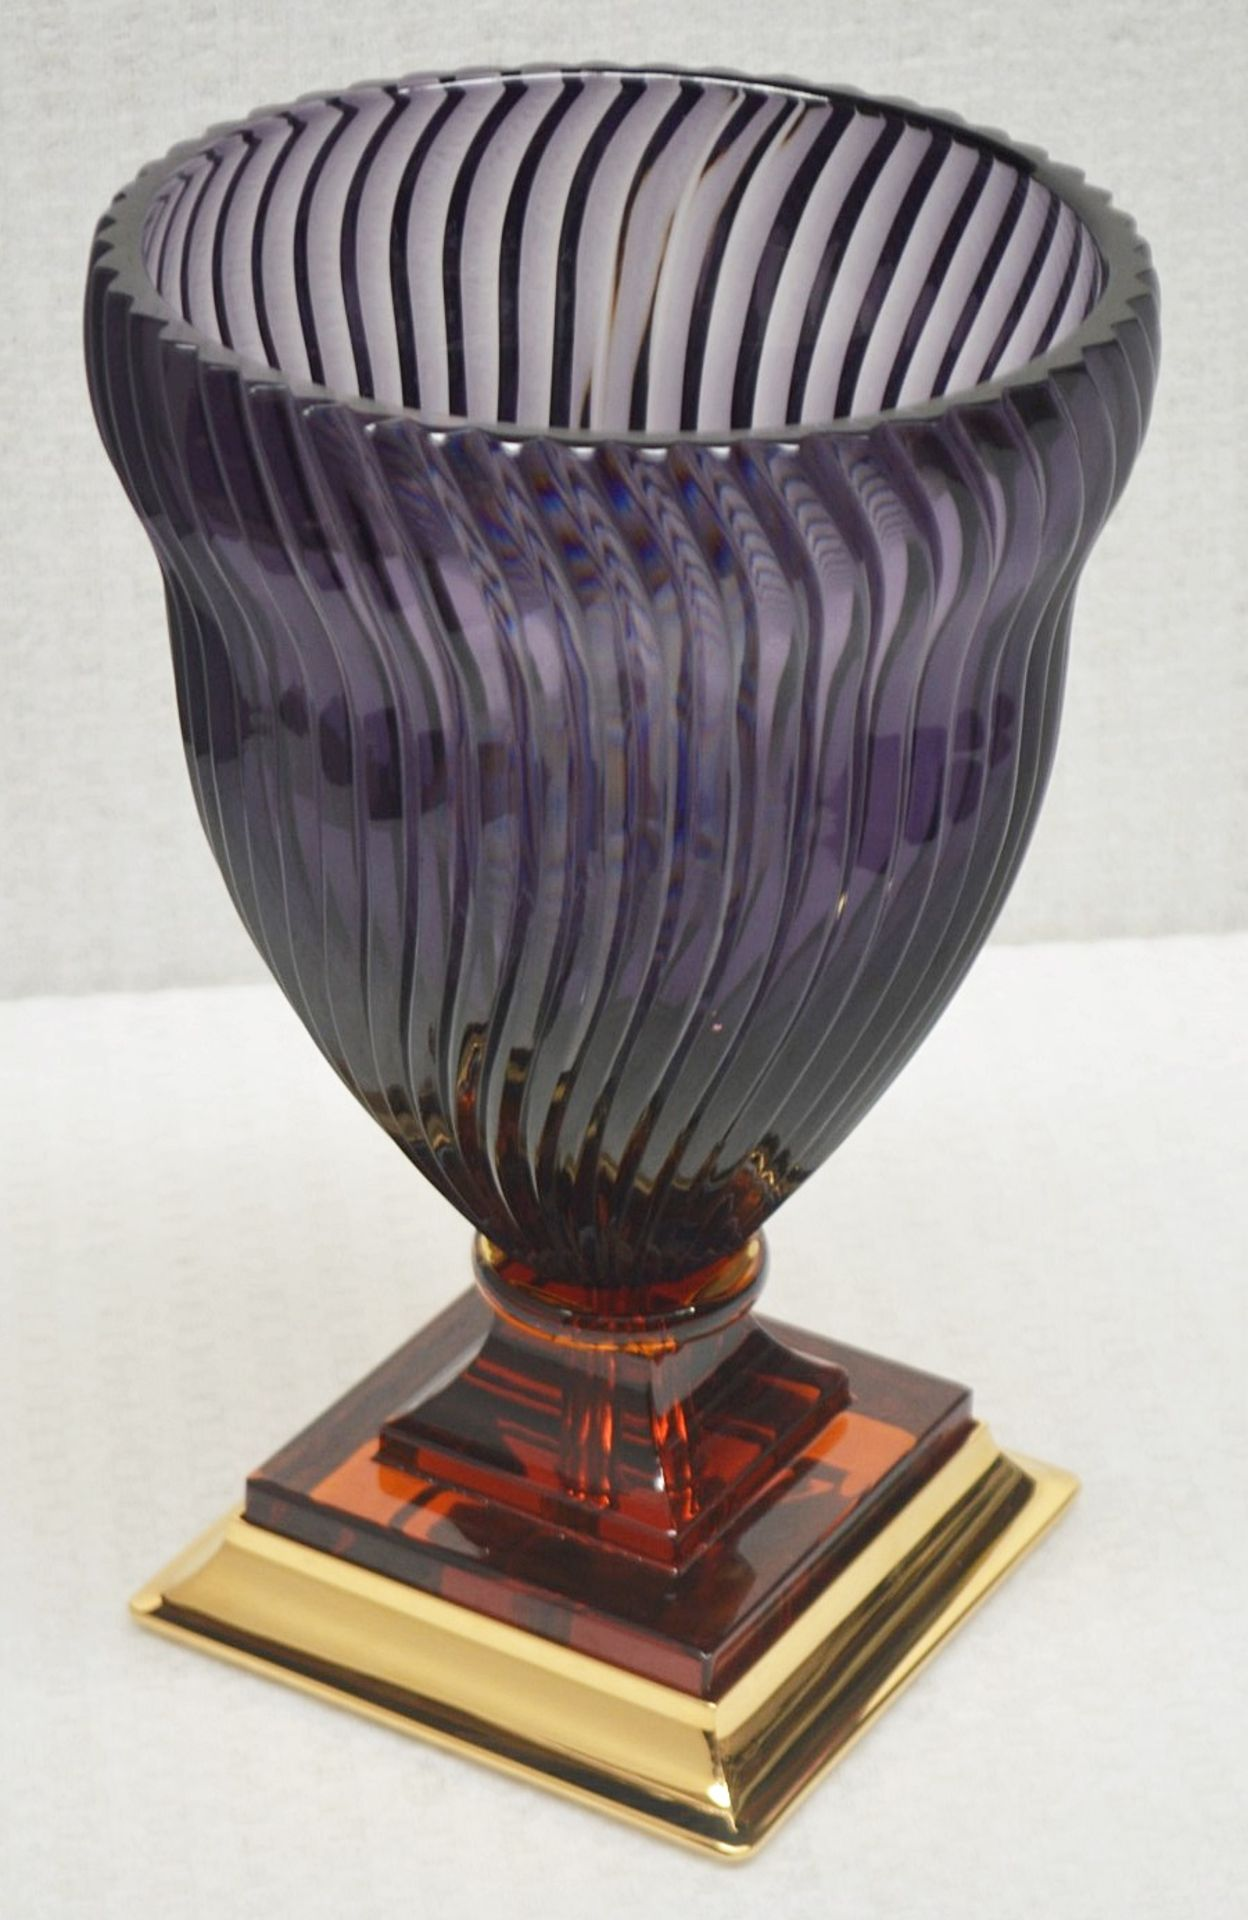 1 x BALDI 'Home Jewels' Italian Hand-crafted Artisan GHIAHDA VASE In Violet Crystal - RRP £1,925